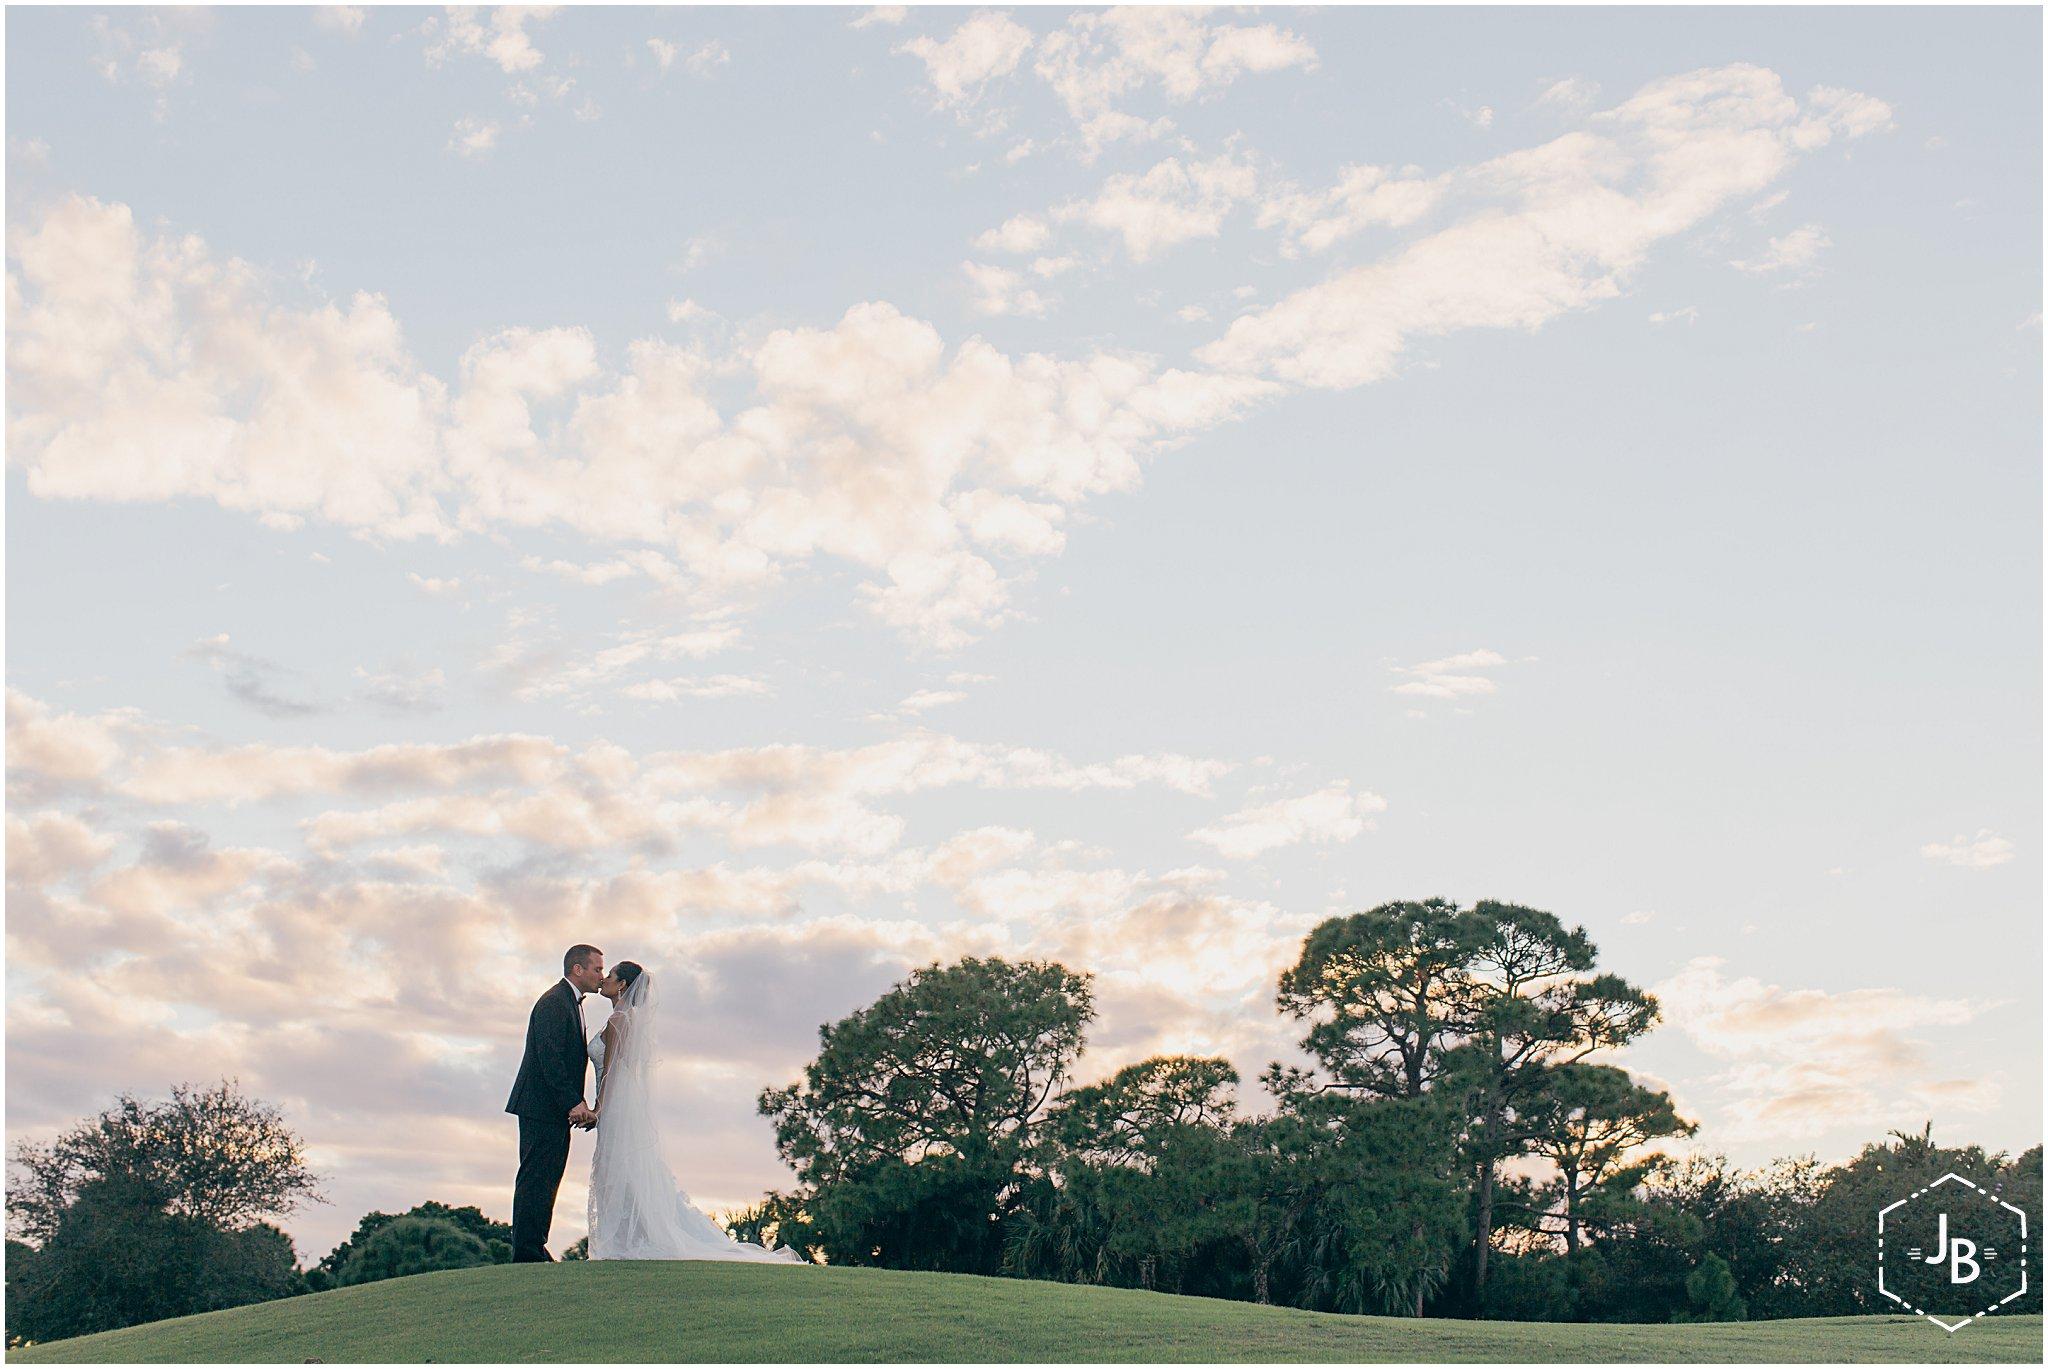 WeddingandEngagementFloridaPhotographer_0259.jpg